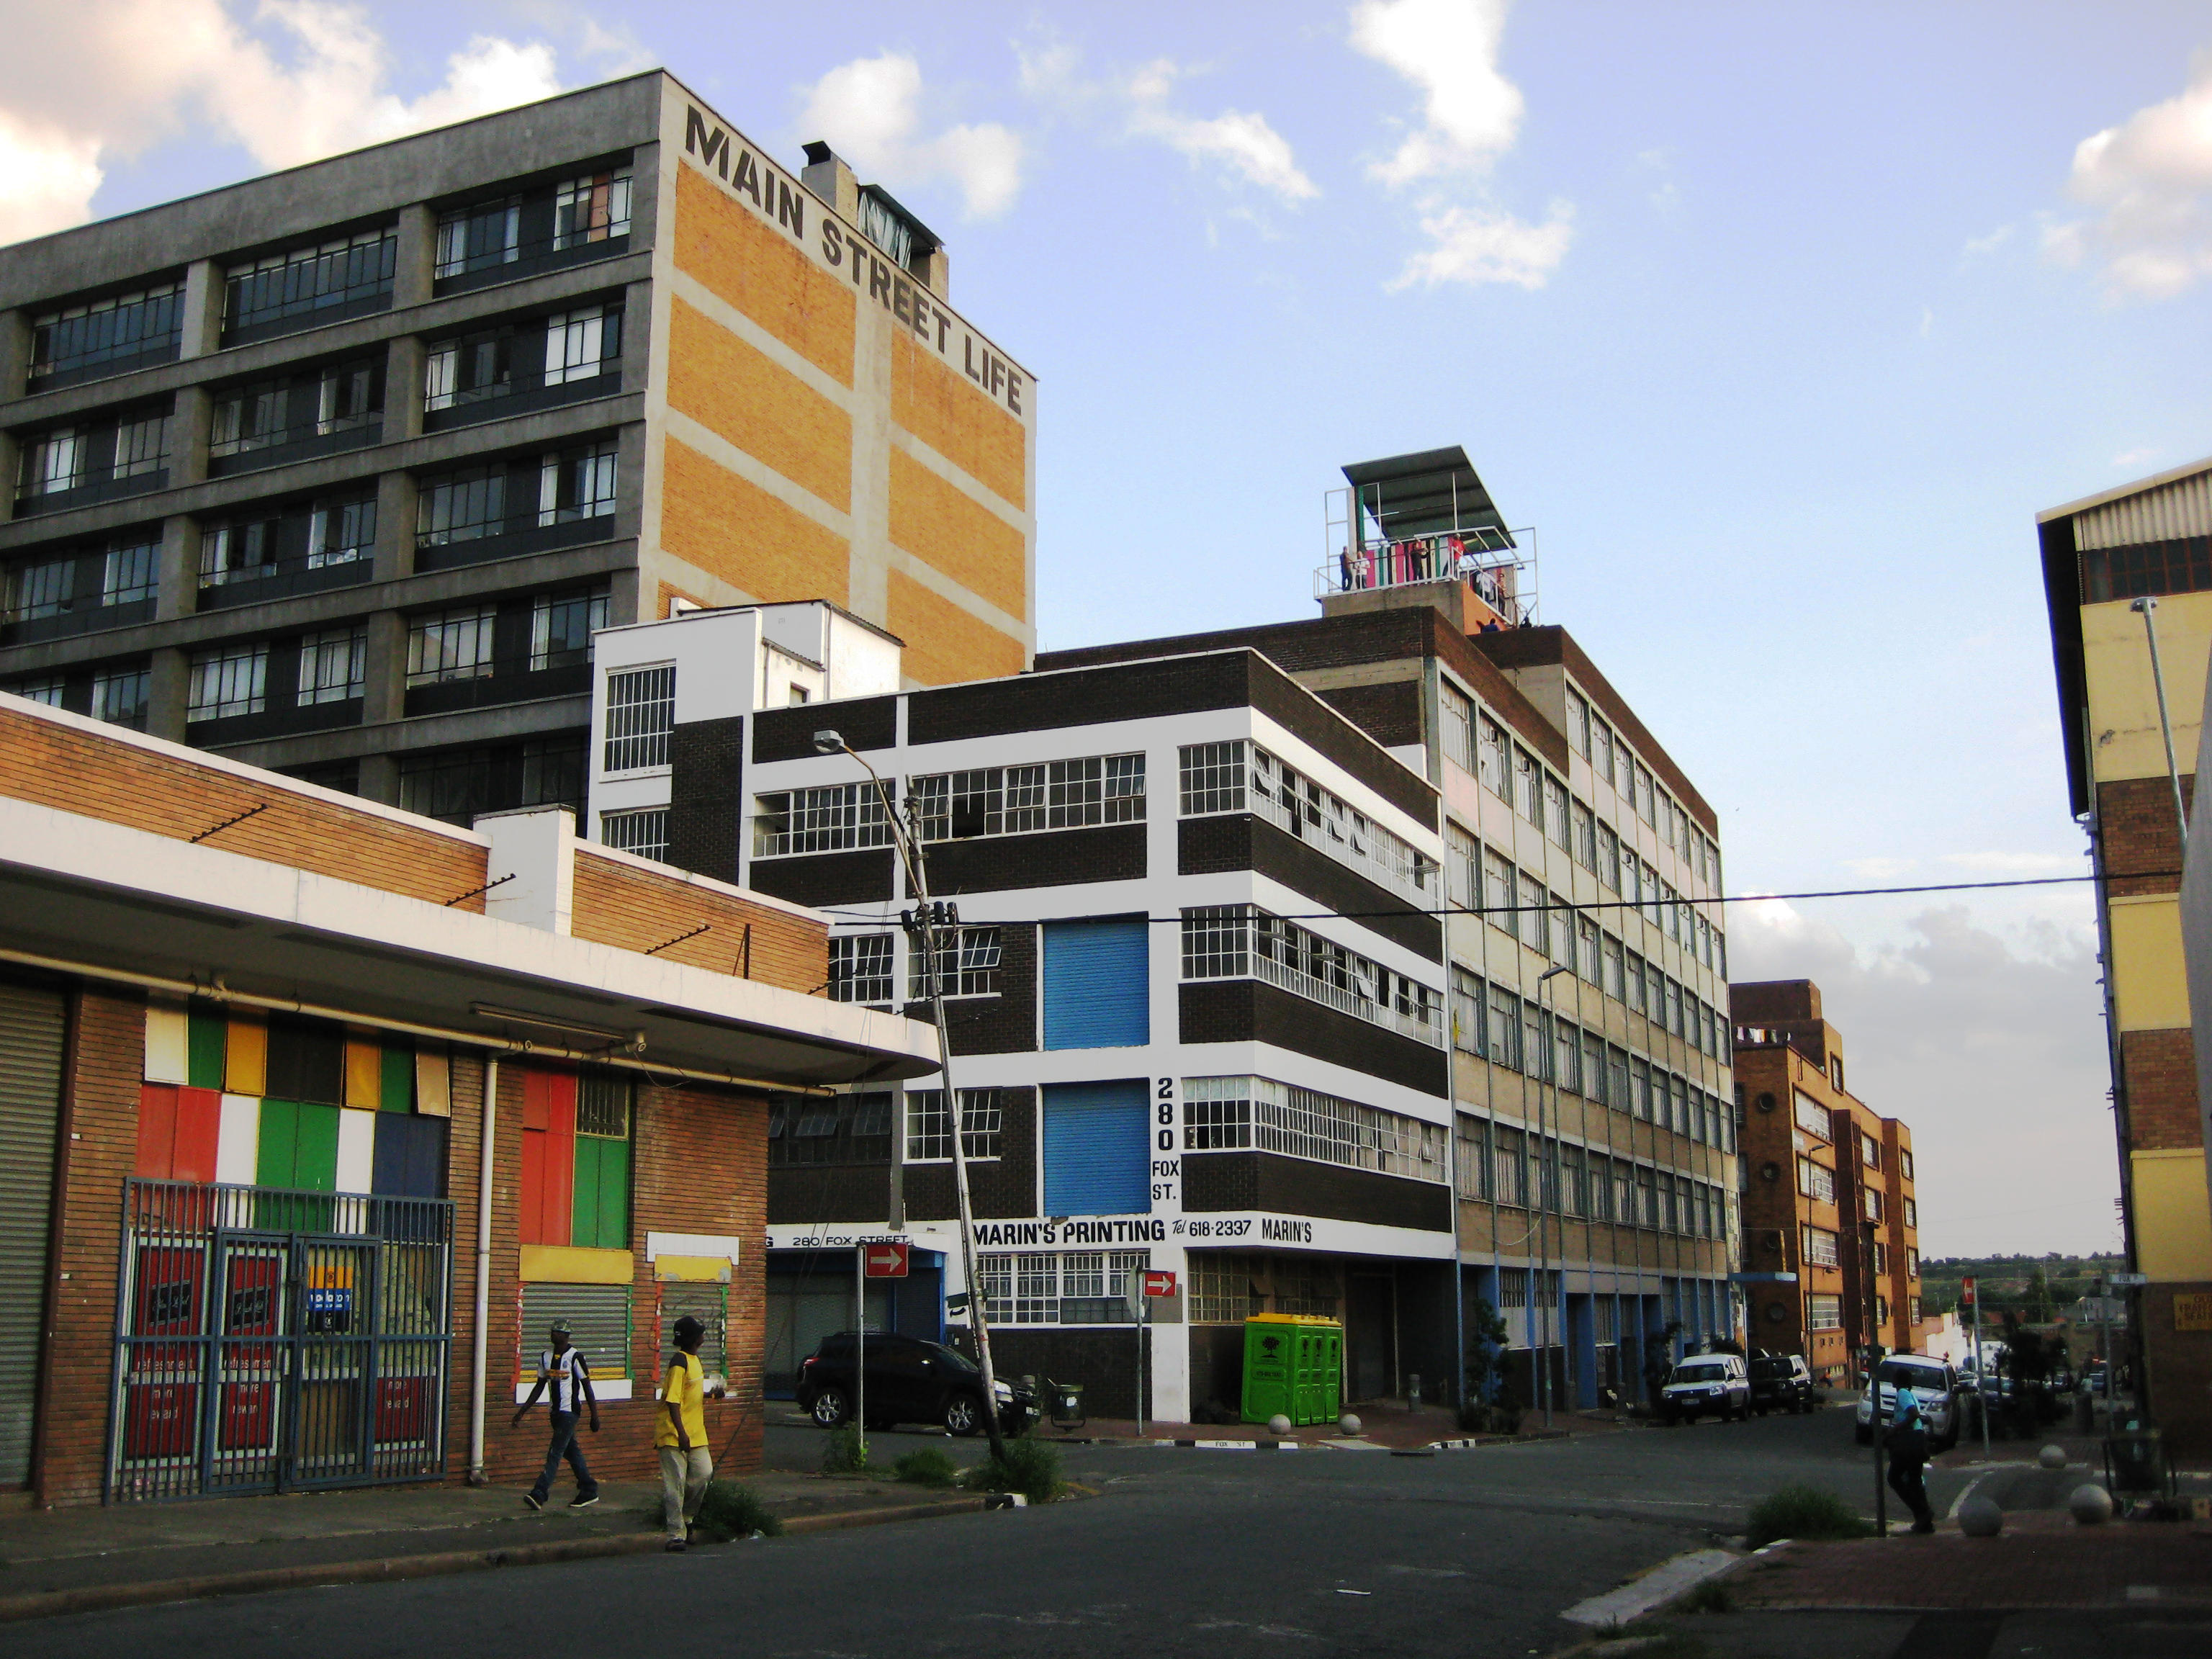 The Main Street Life building